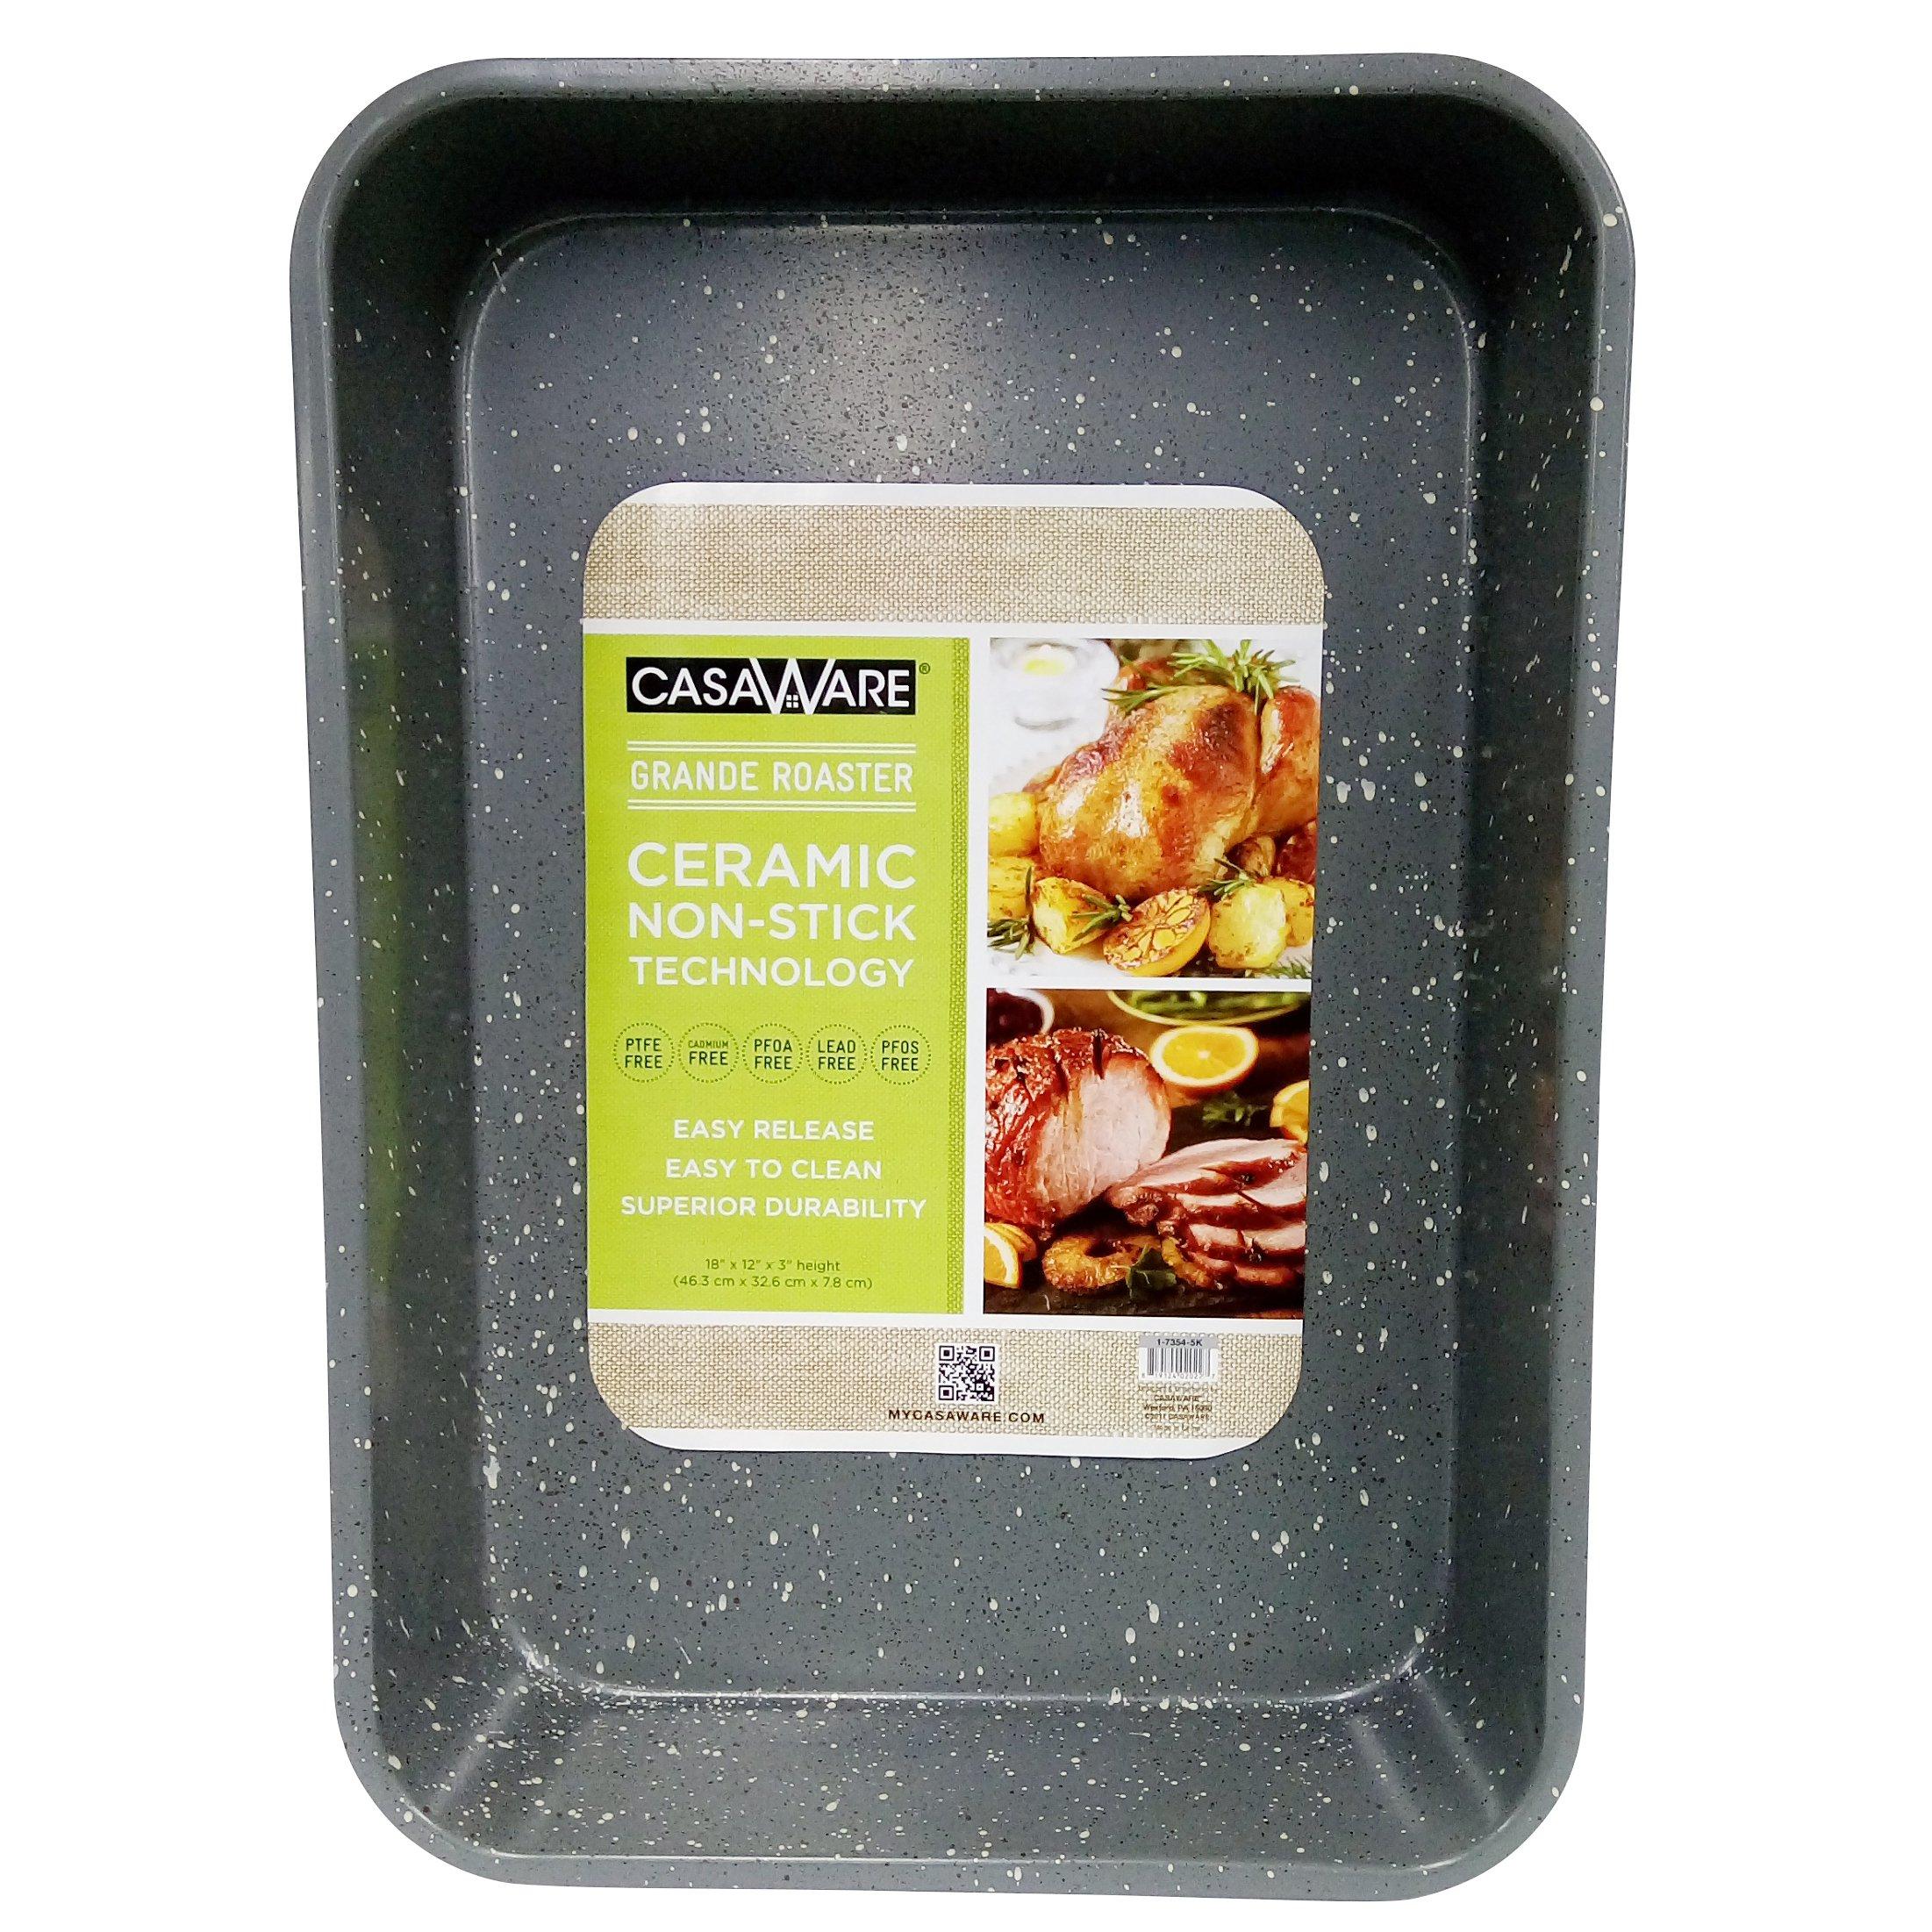 casaWare Grande Lasagna/Roaster Pan 18 x 12 x 3-Inch - Extra Large, Ceramic Coated NonStick (Silver Granite) by casaWare